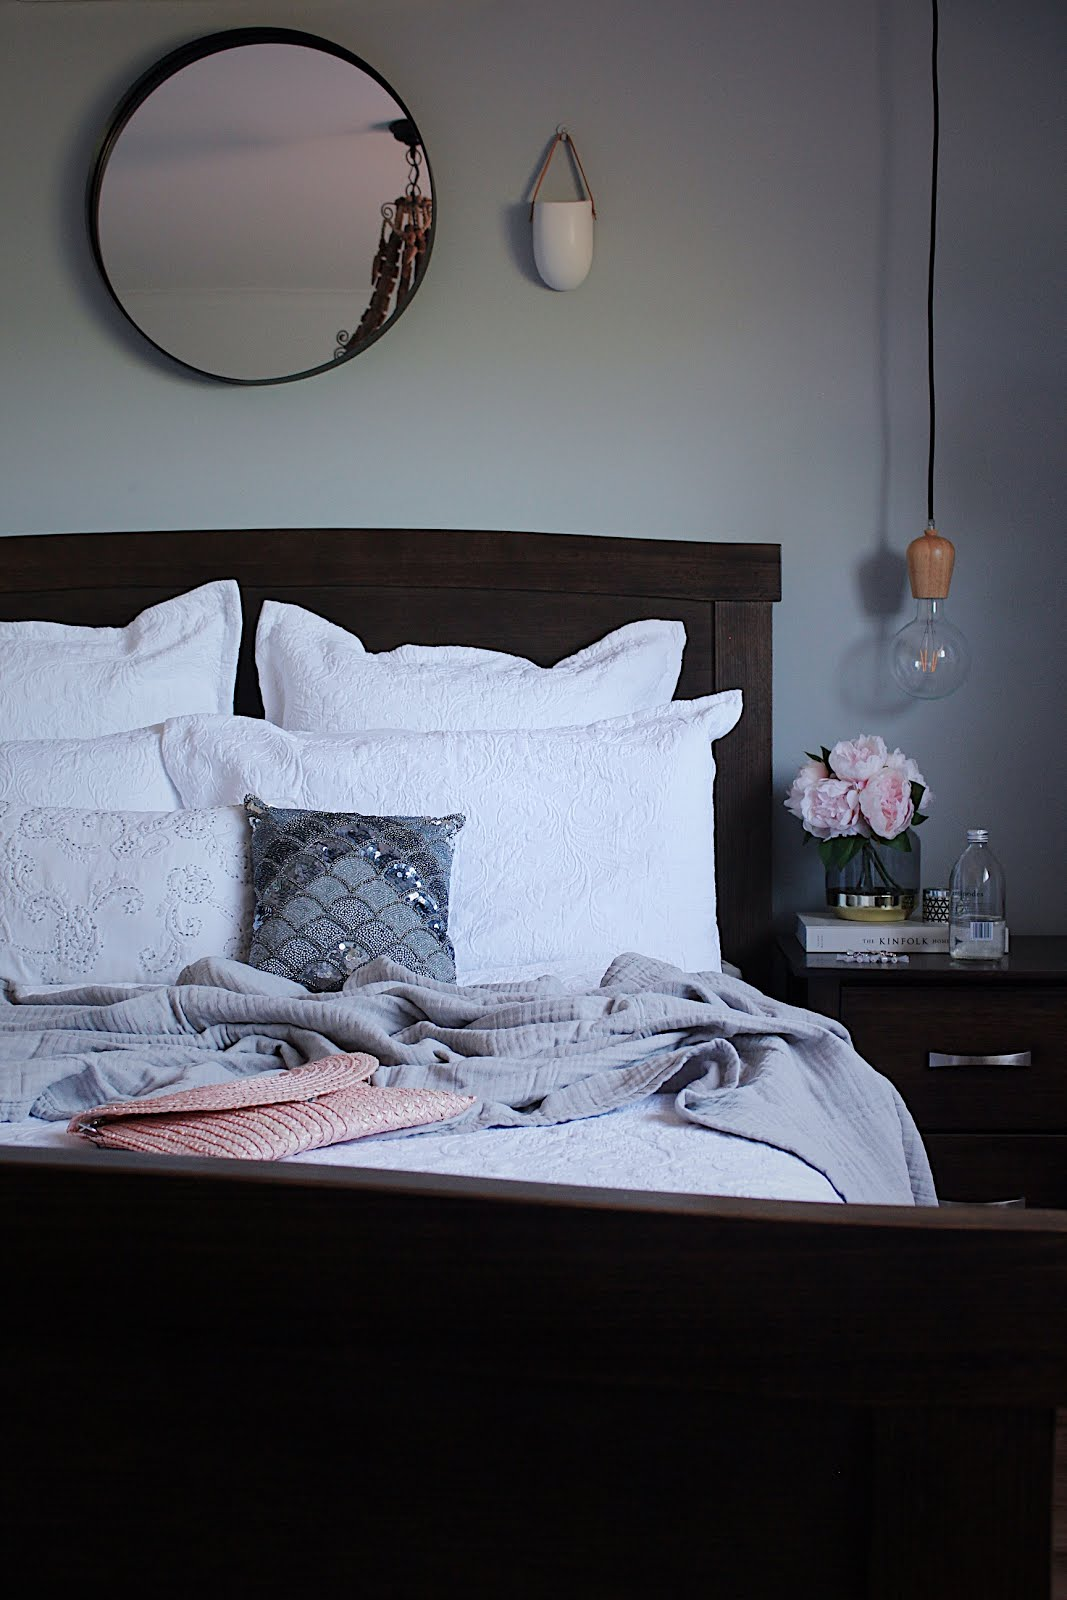 La Maison Jolie Dreamy Linen To Refresh Your Bedroom For A New Season